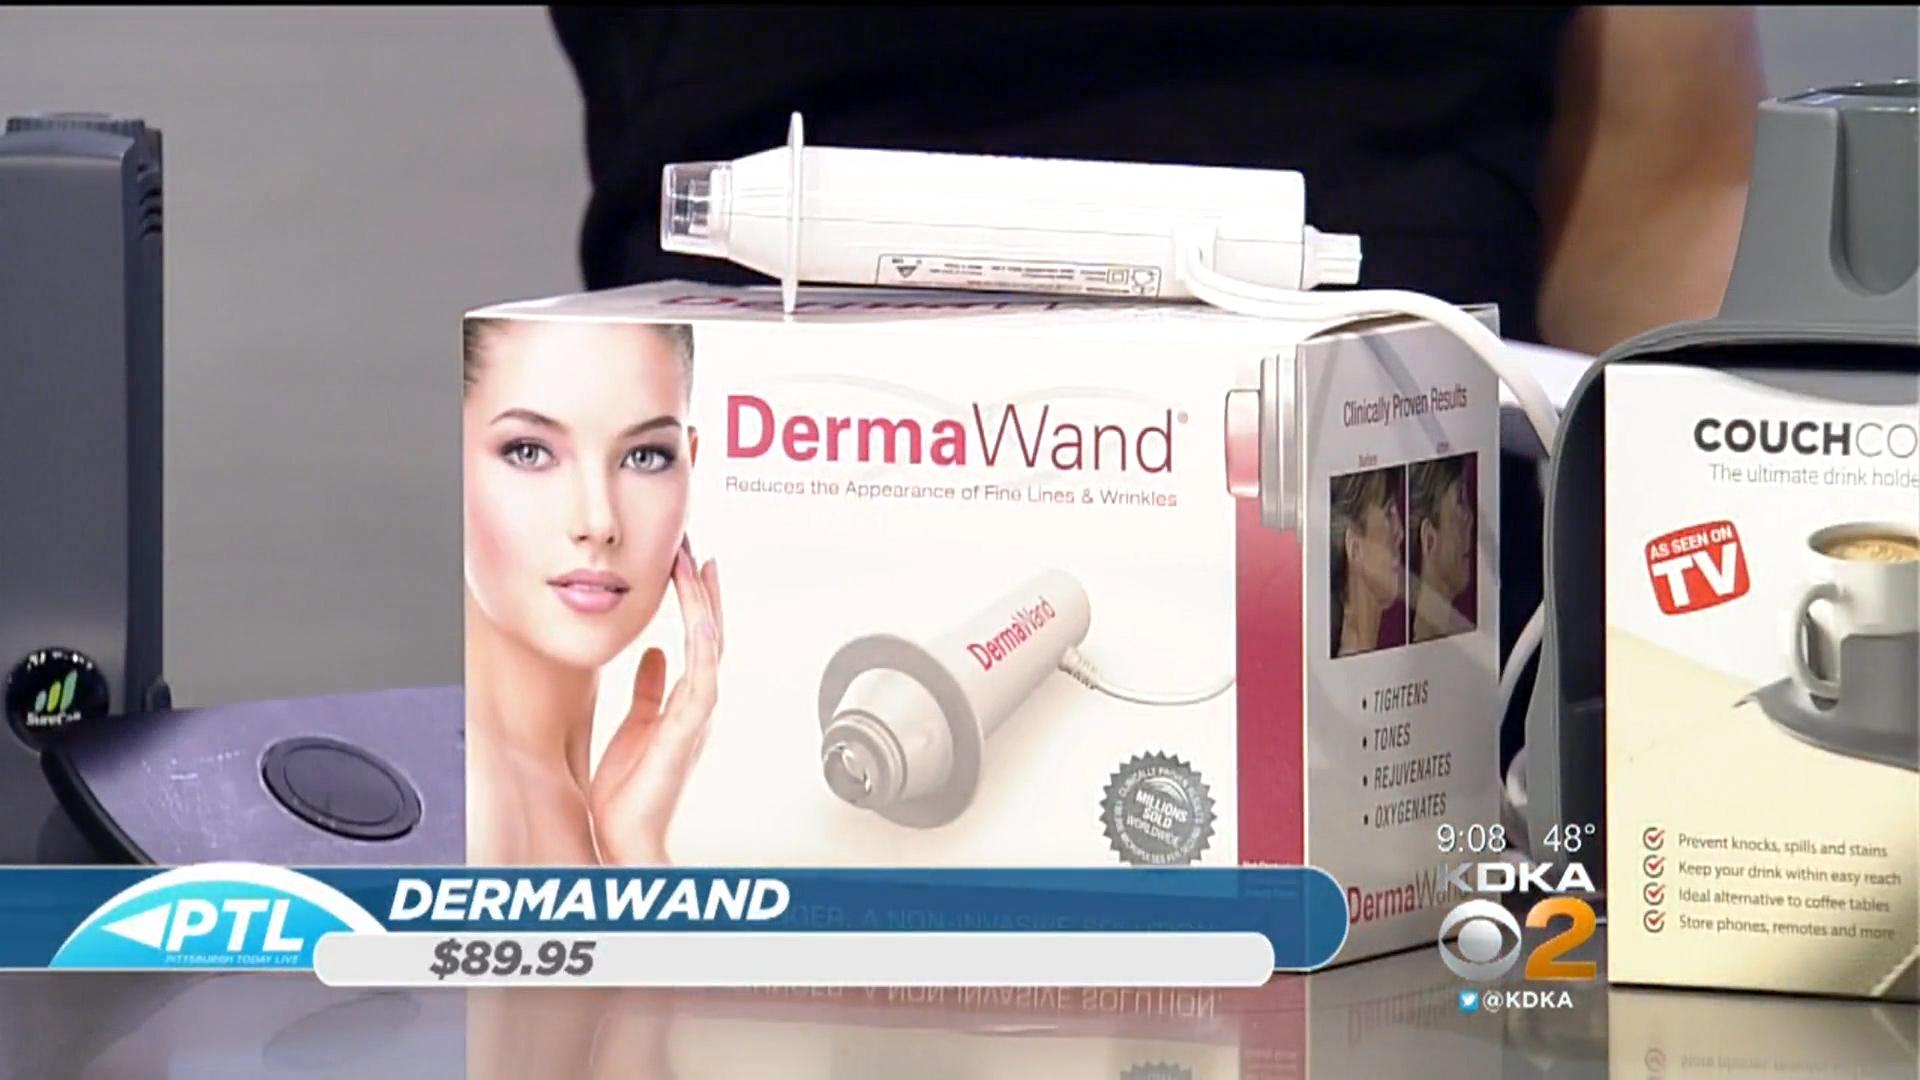 DERMAWAND - $89.95Shop Now